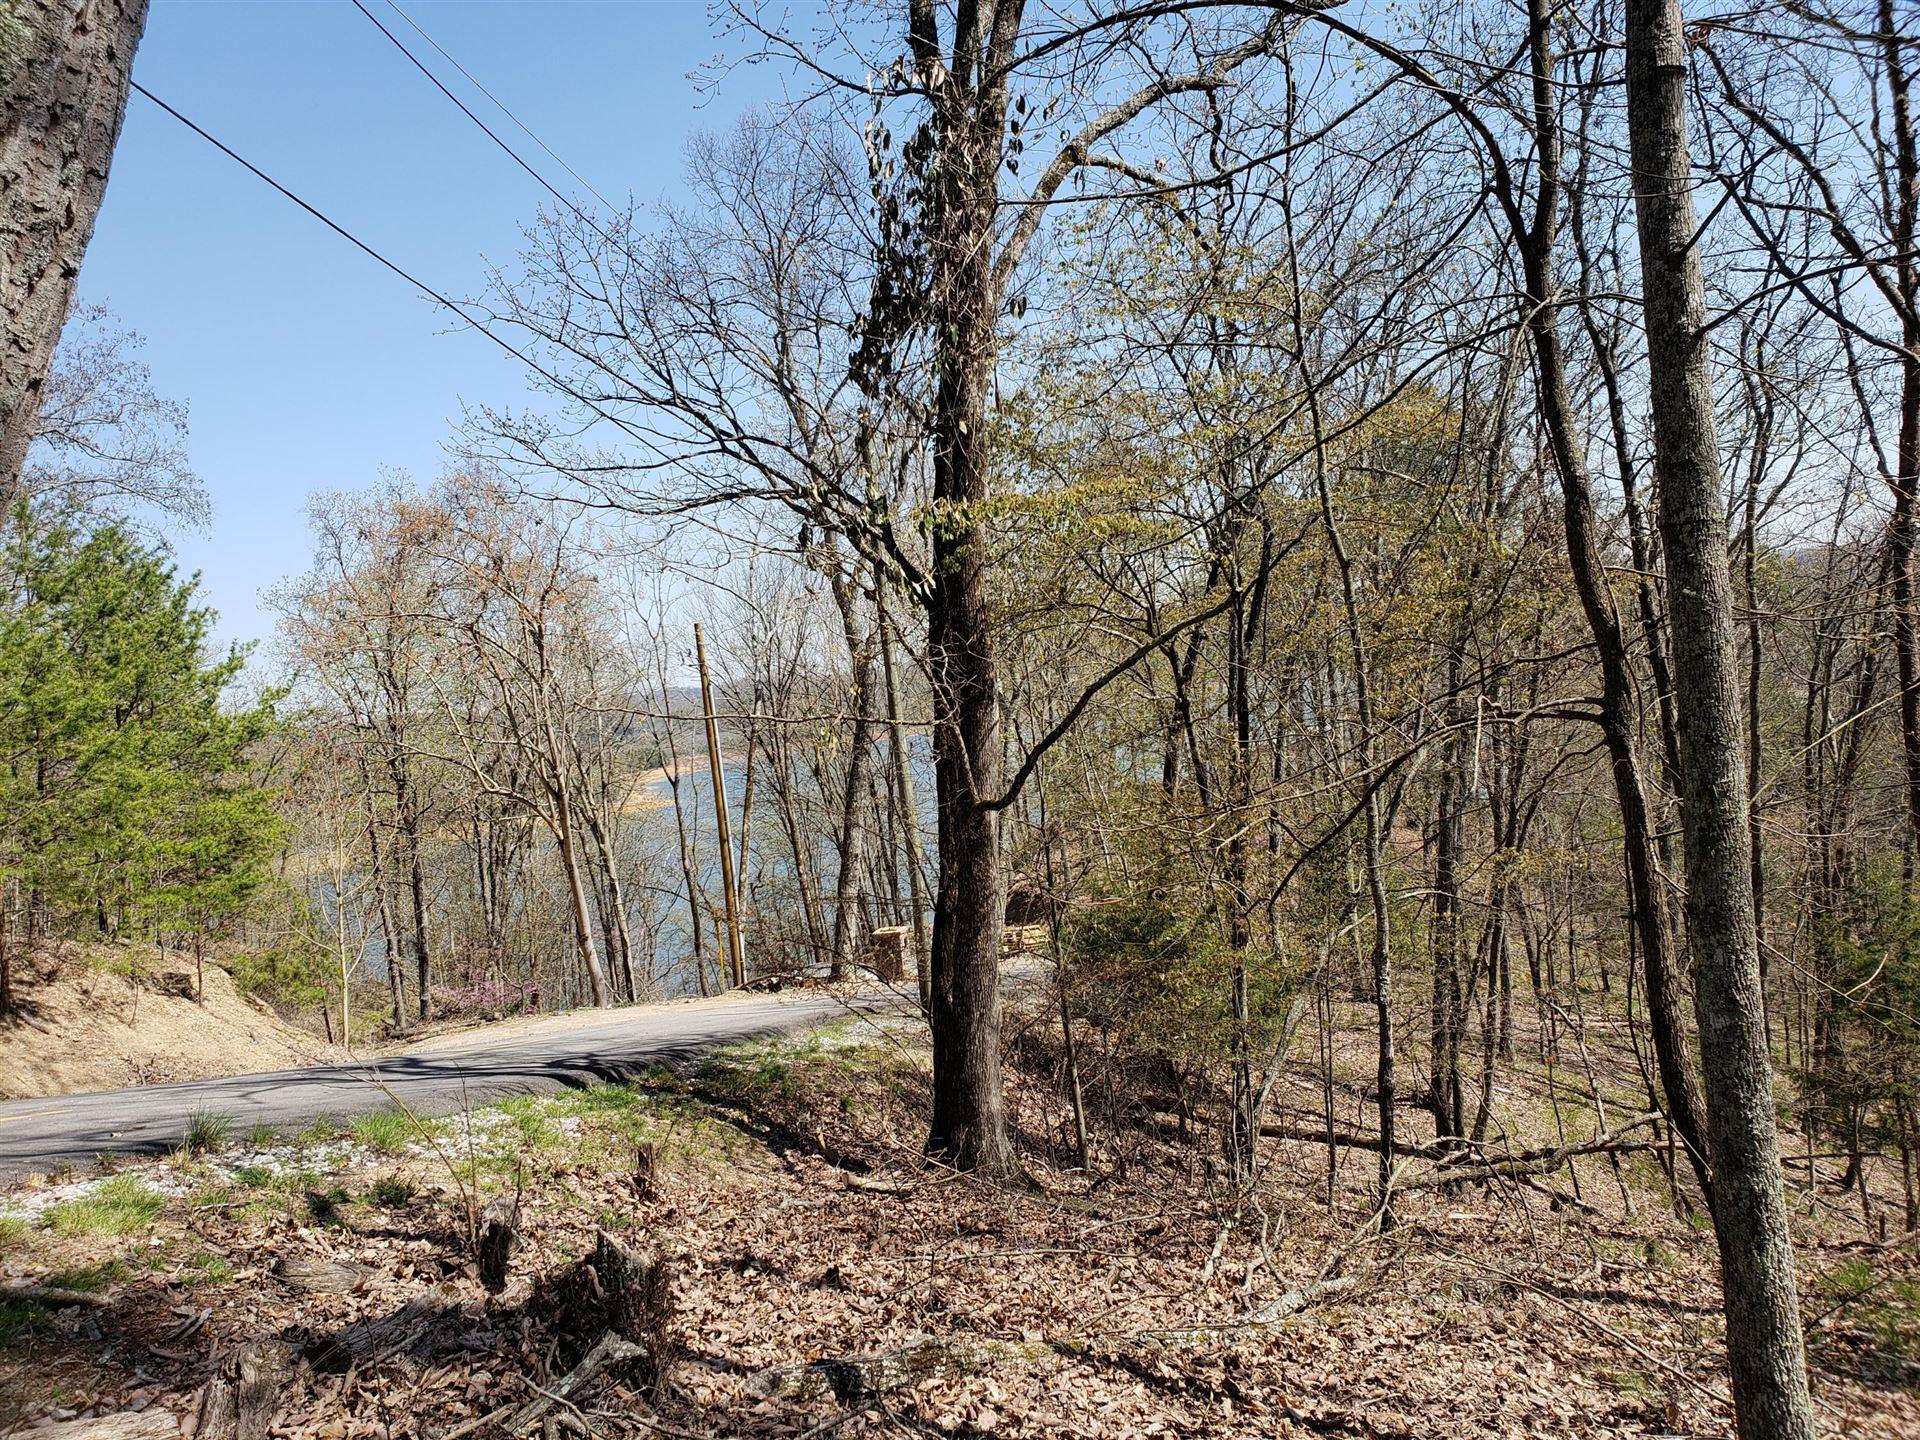 Photo for 856 Wilderness Drive, Mooresburg, TN 37811 (MLS # 1111943)